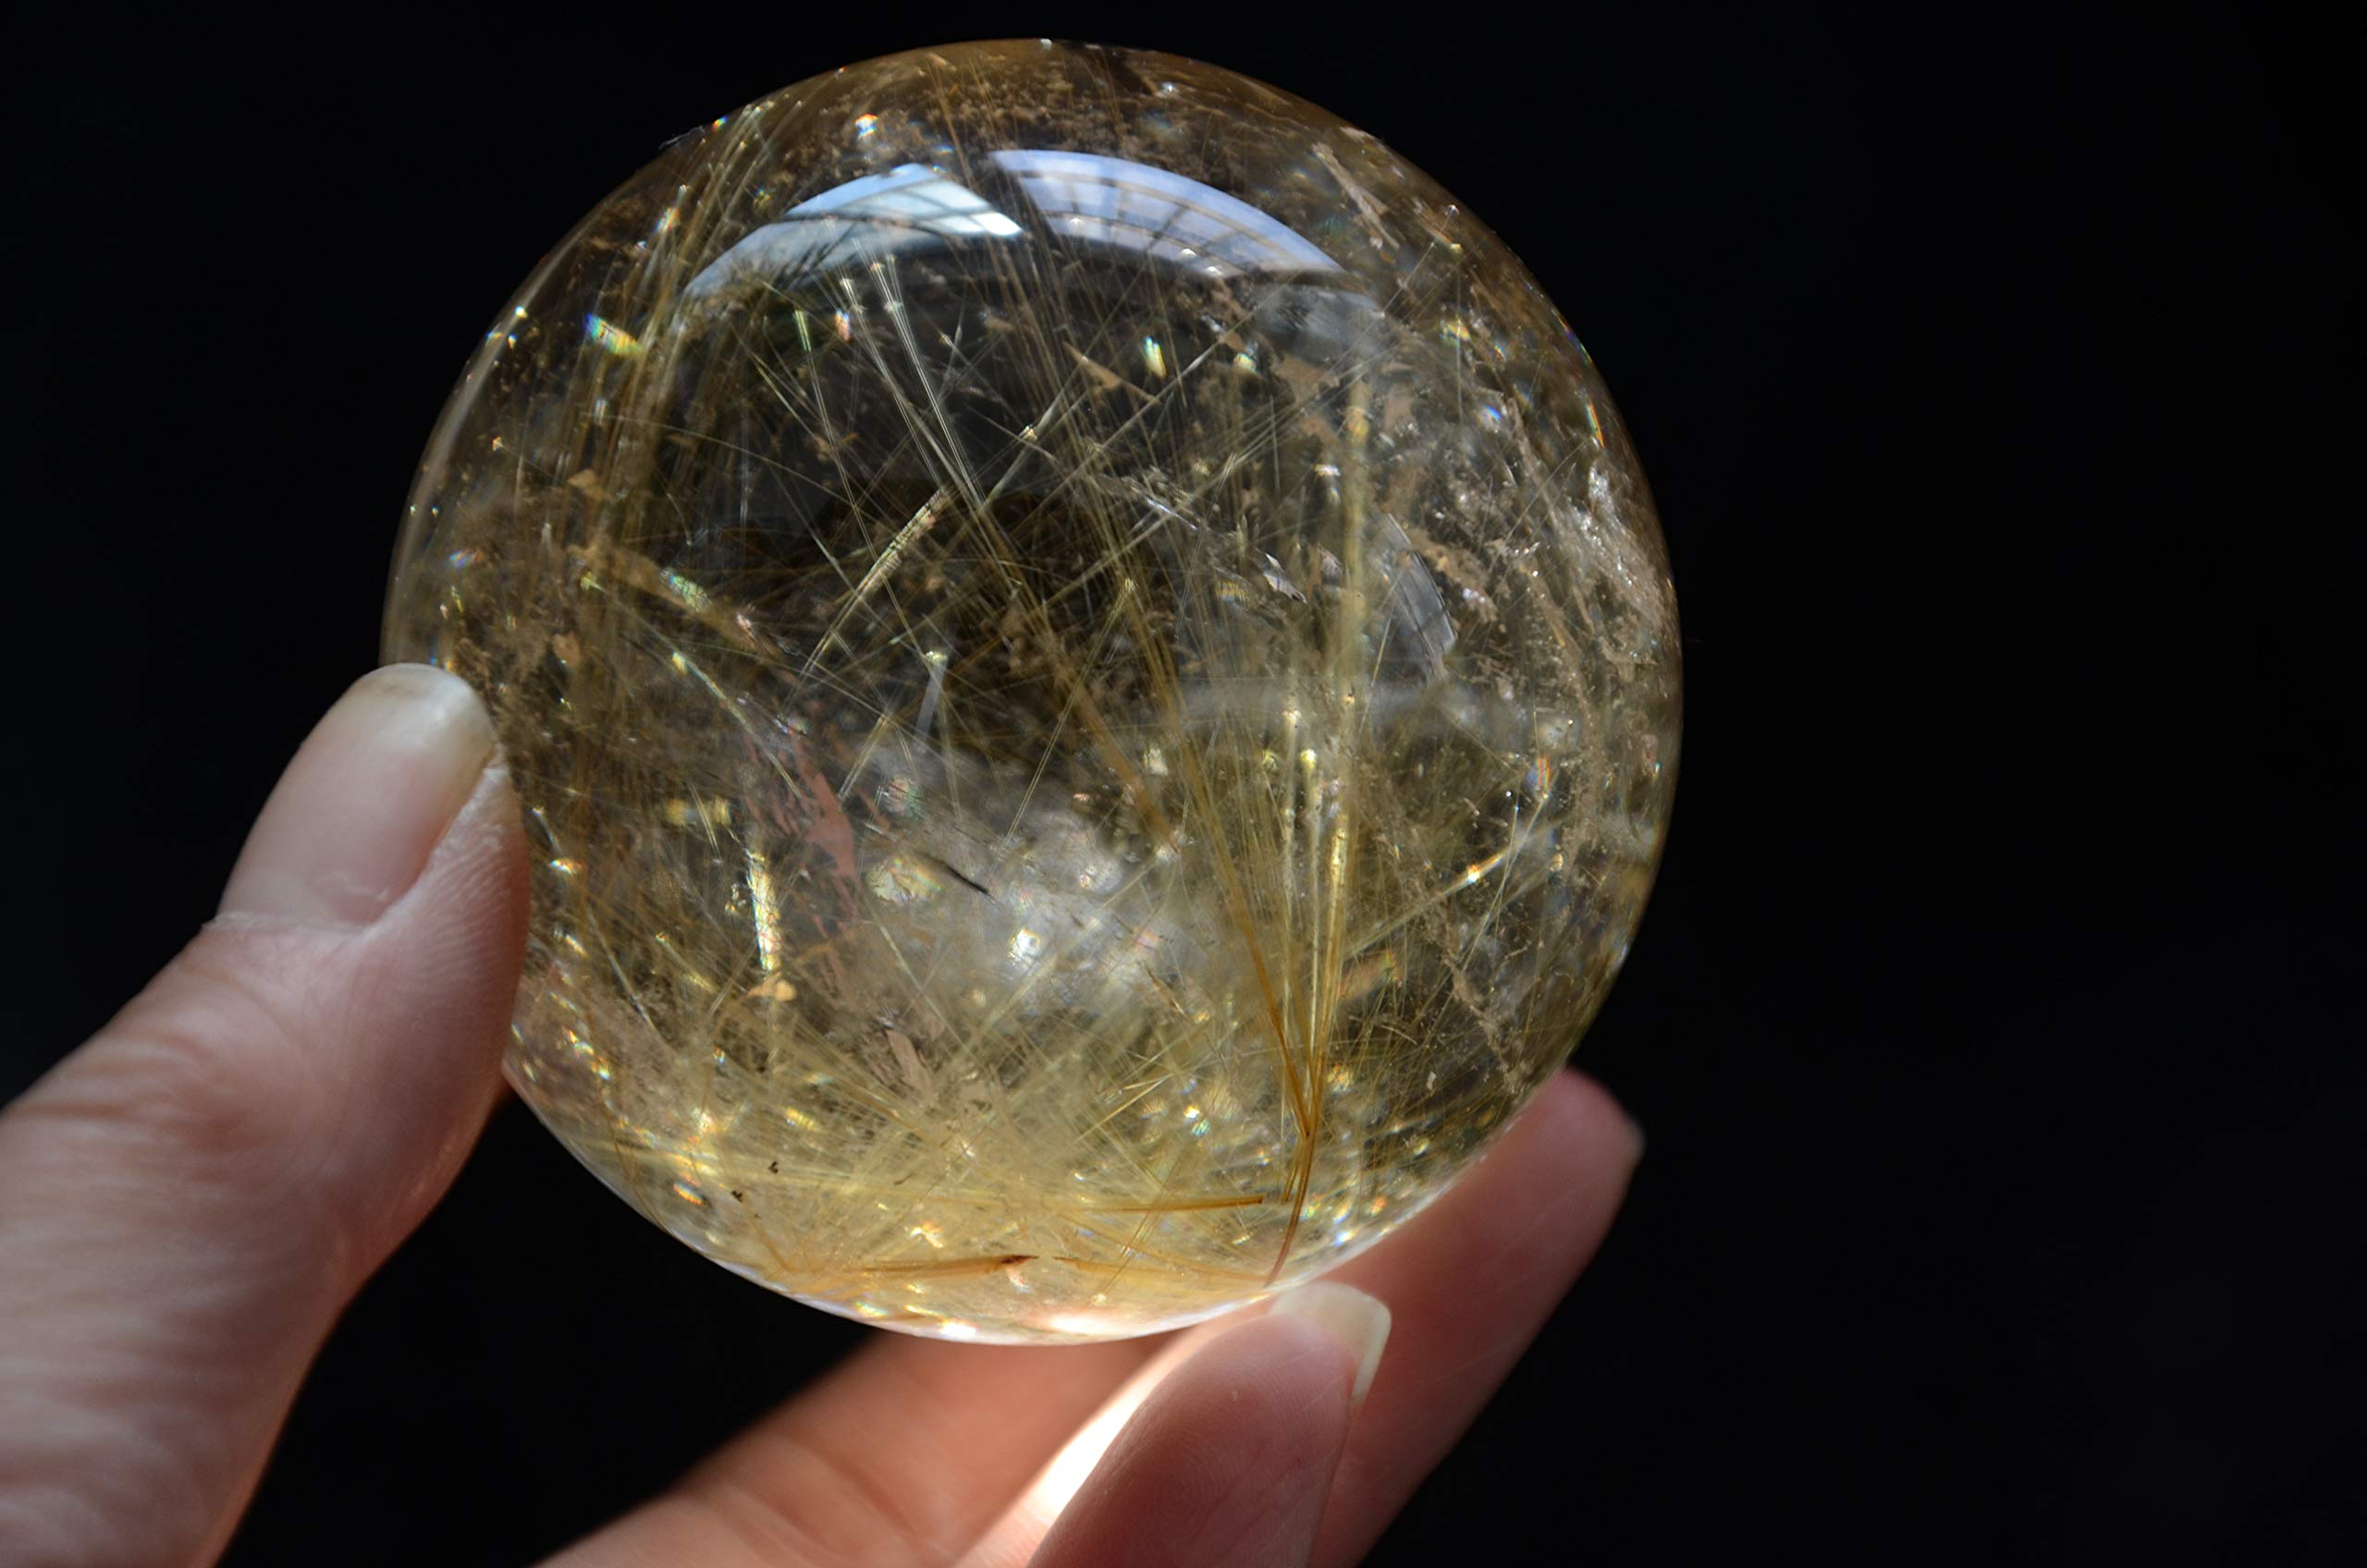 Real Tibetan Himalayan High Altitude Clear Gold Rutilated Crystal Quartz Ball Sphere Orb 2.51Inch Spiritual Reiki Healing